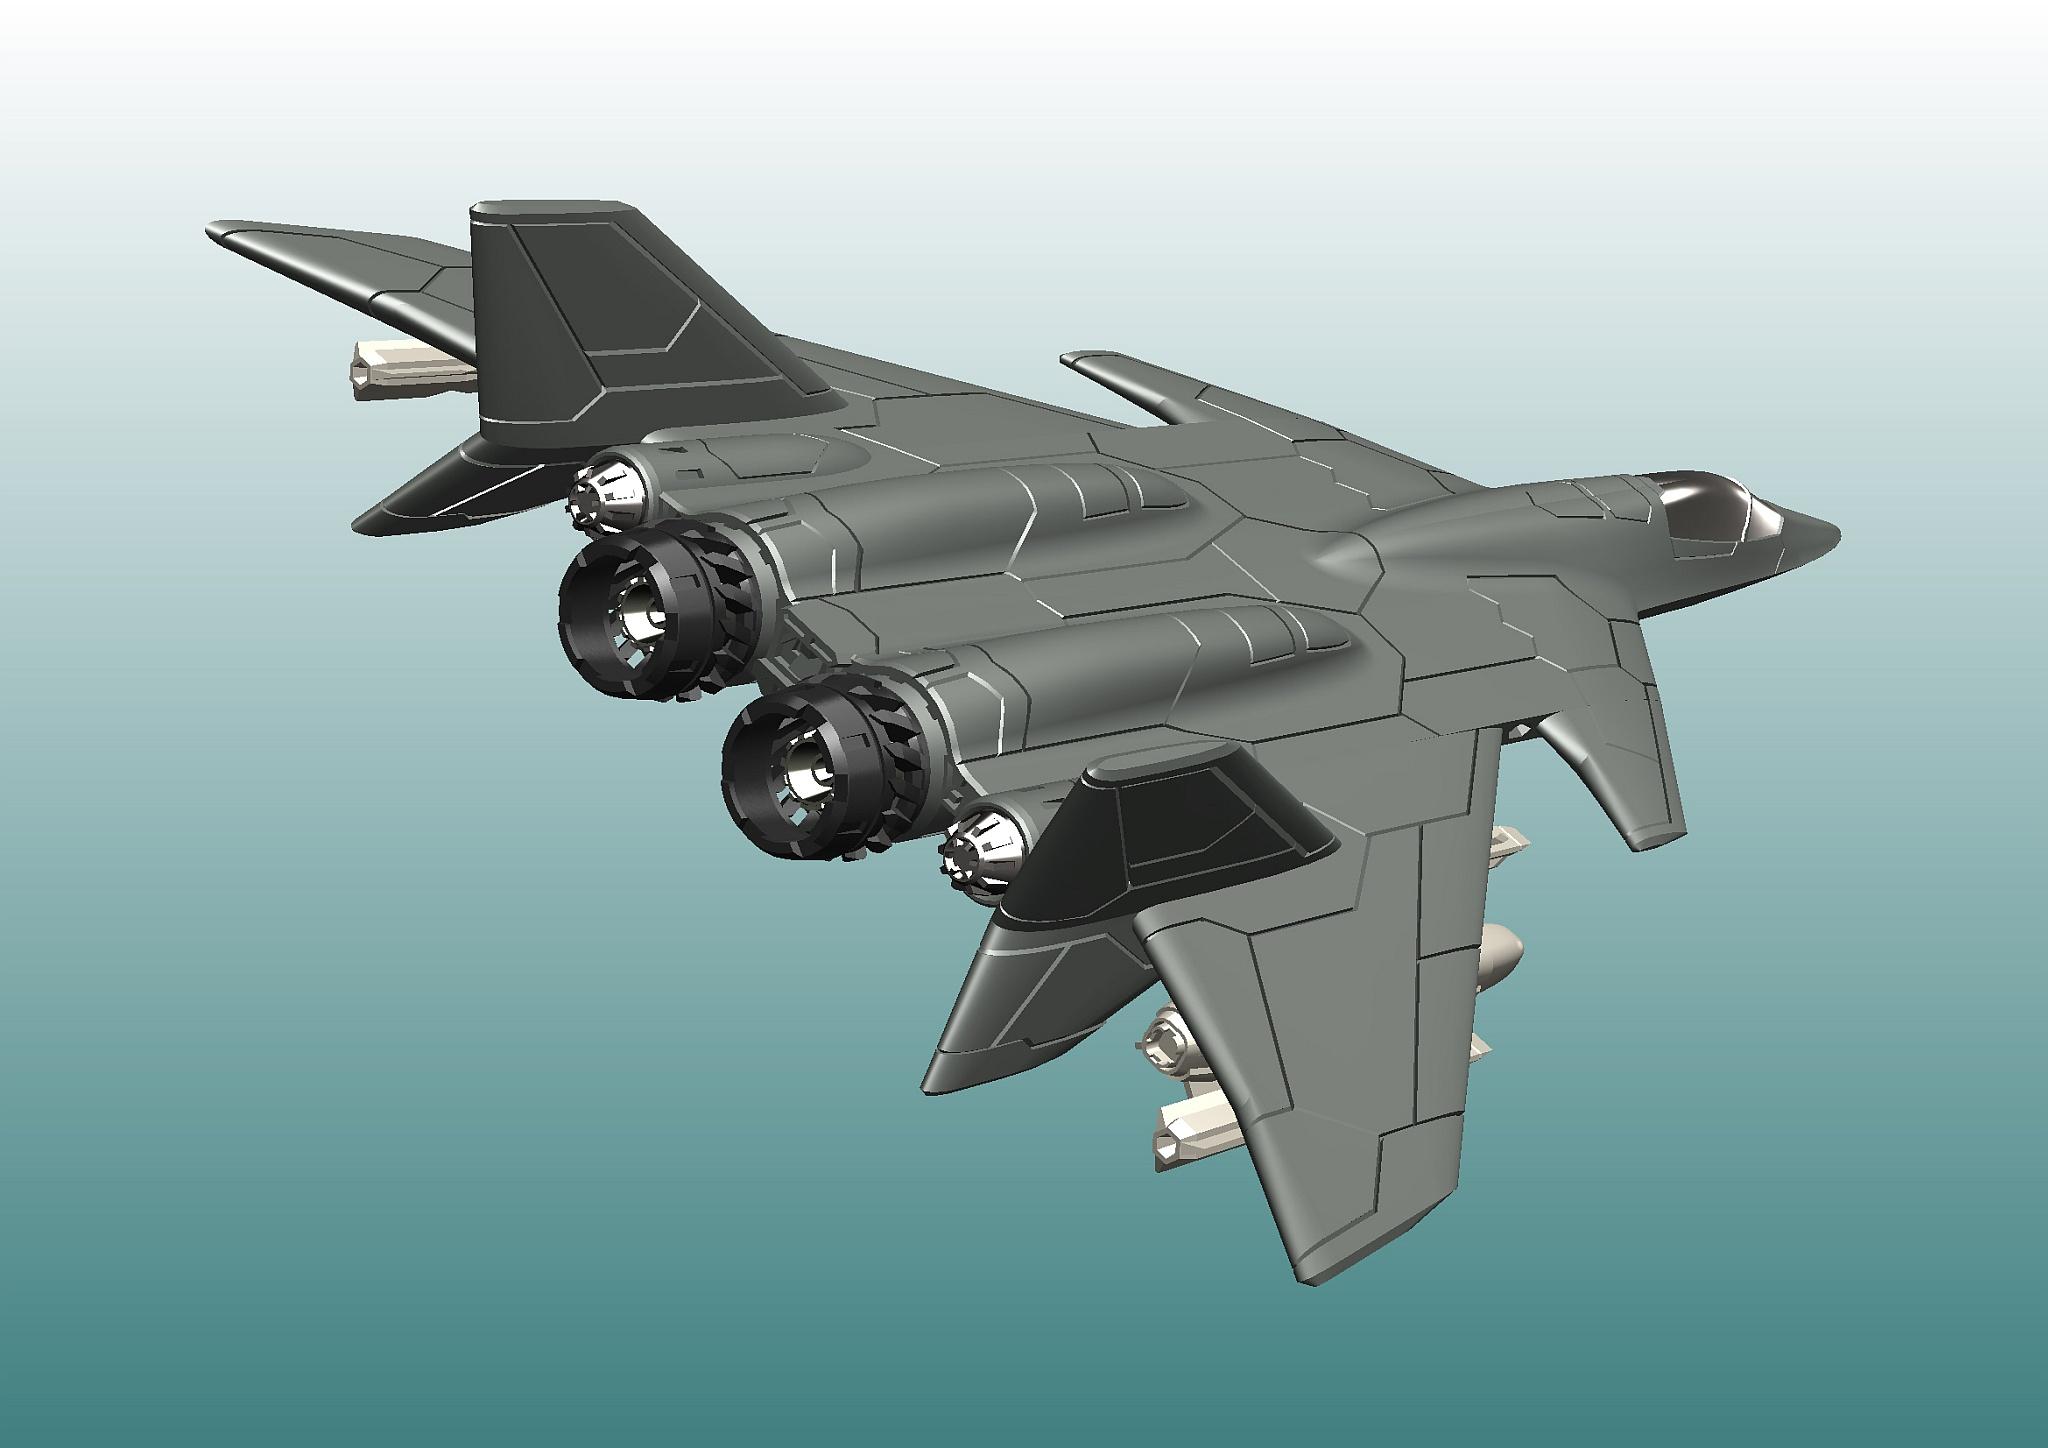 F-95 morningstar wing战斗机造型3D图纸 x_t step格式